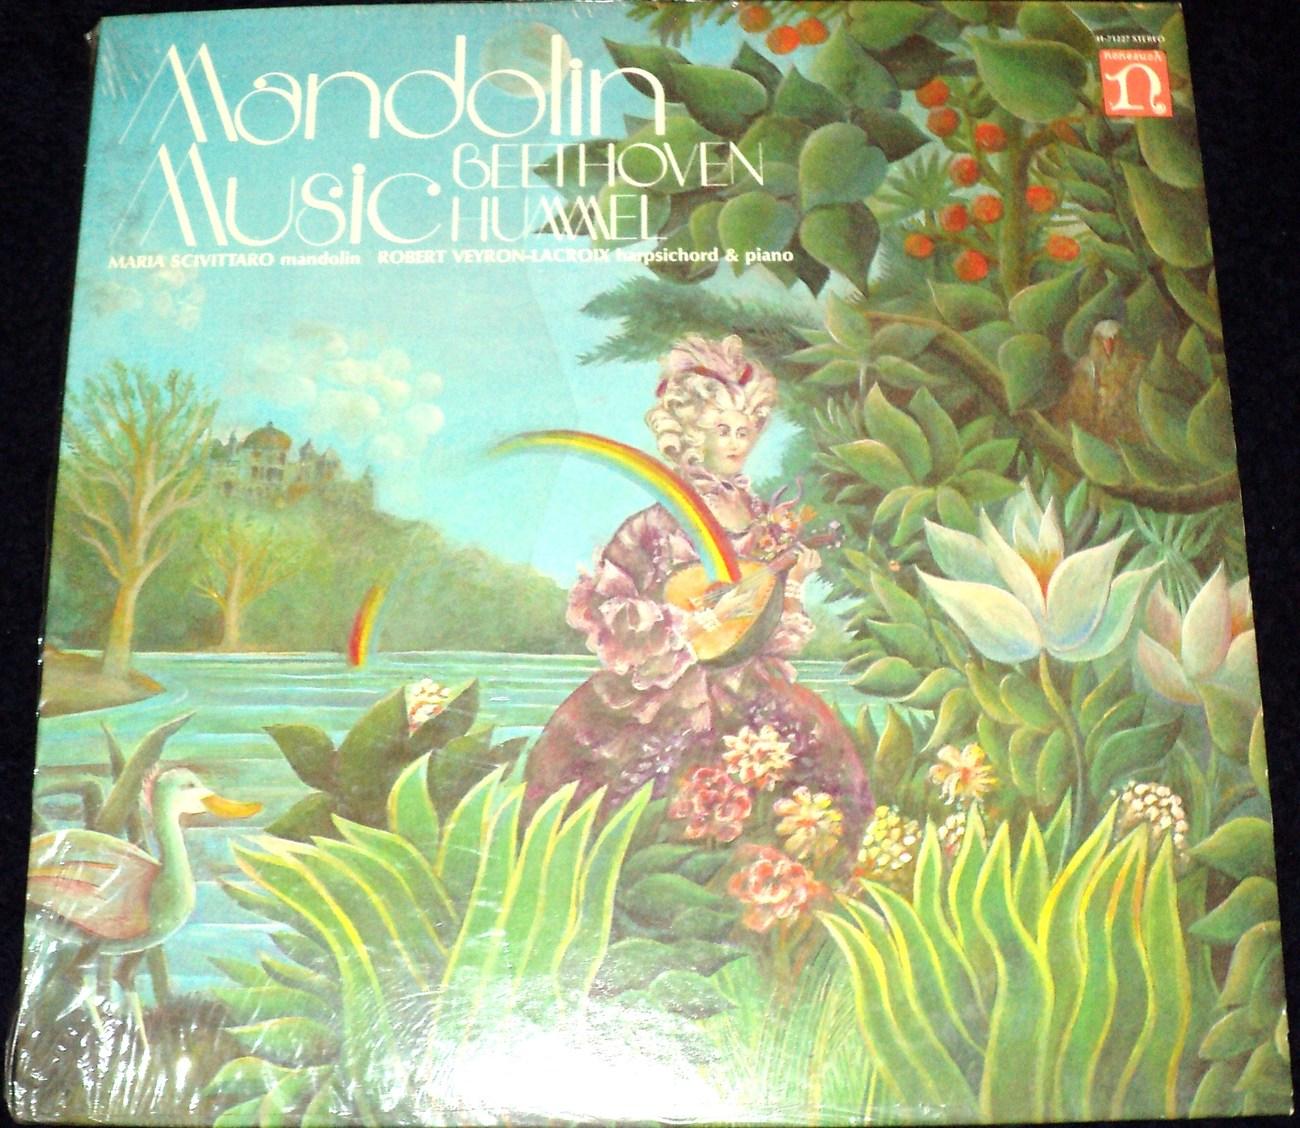 MANDOLIN MUSIC /BEETHOVEN /HUMMEL LP